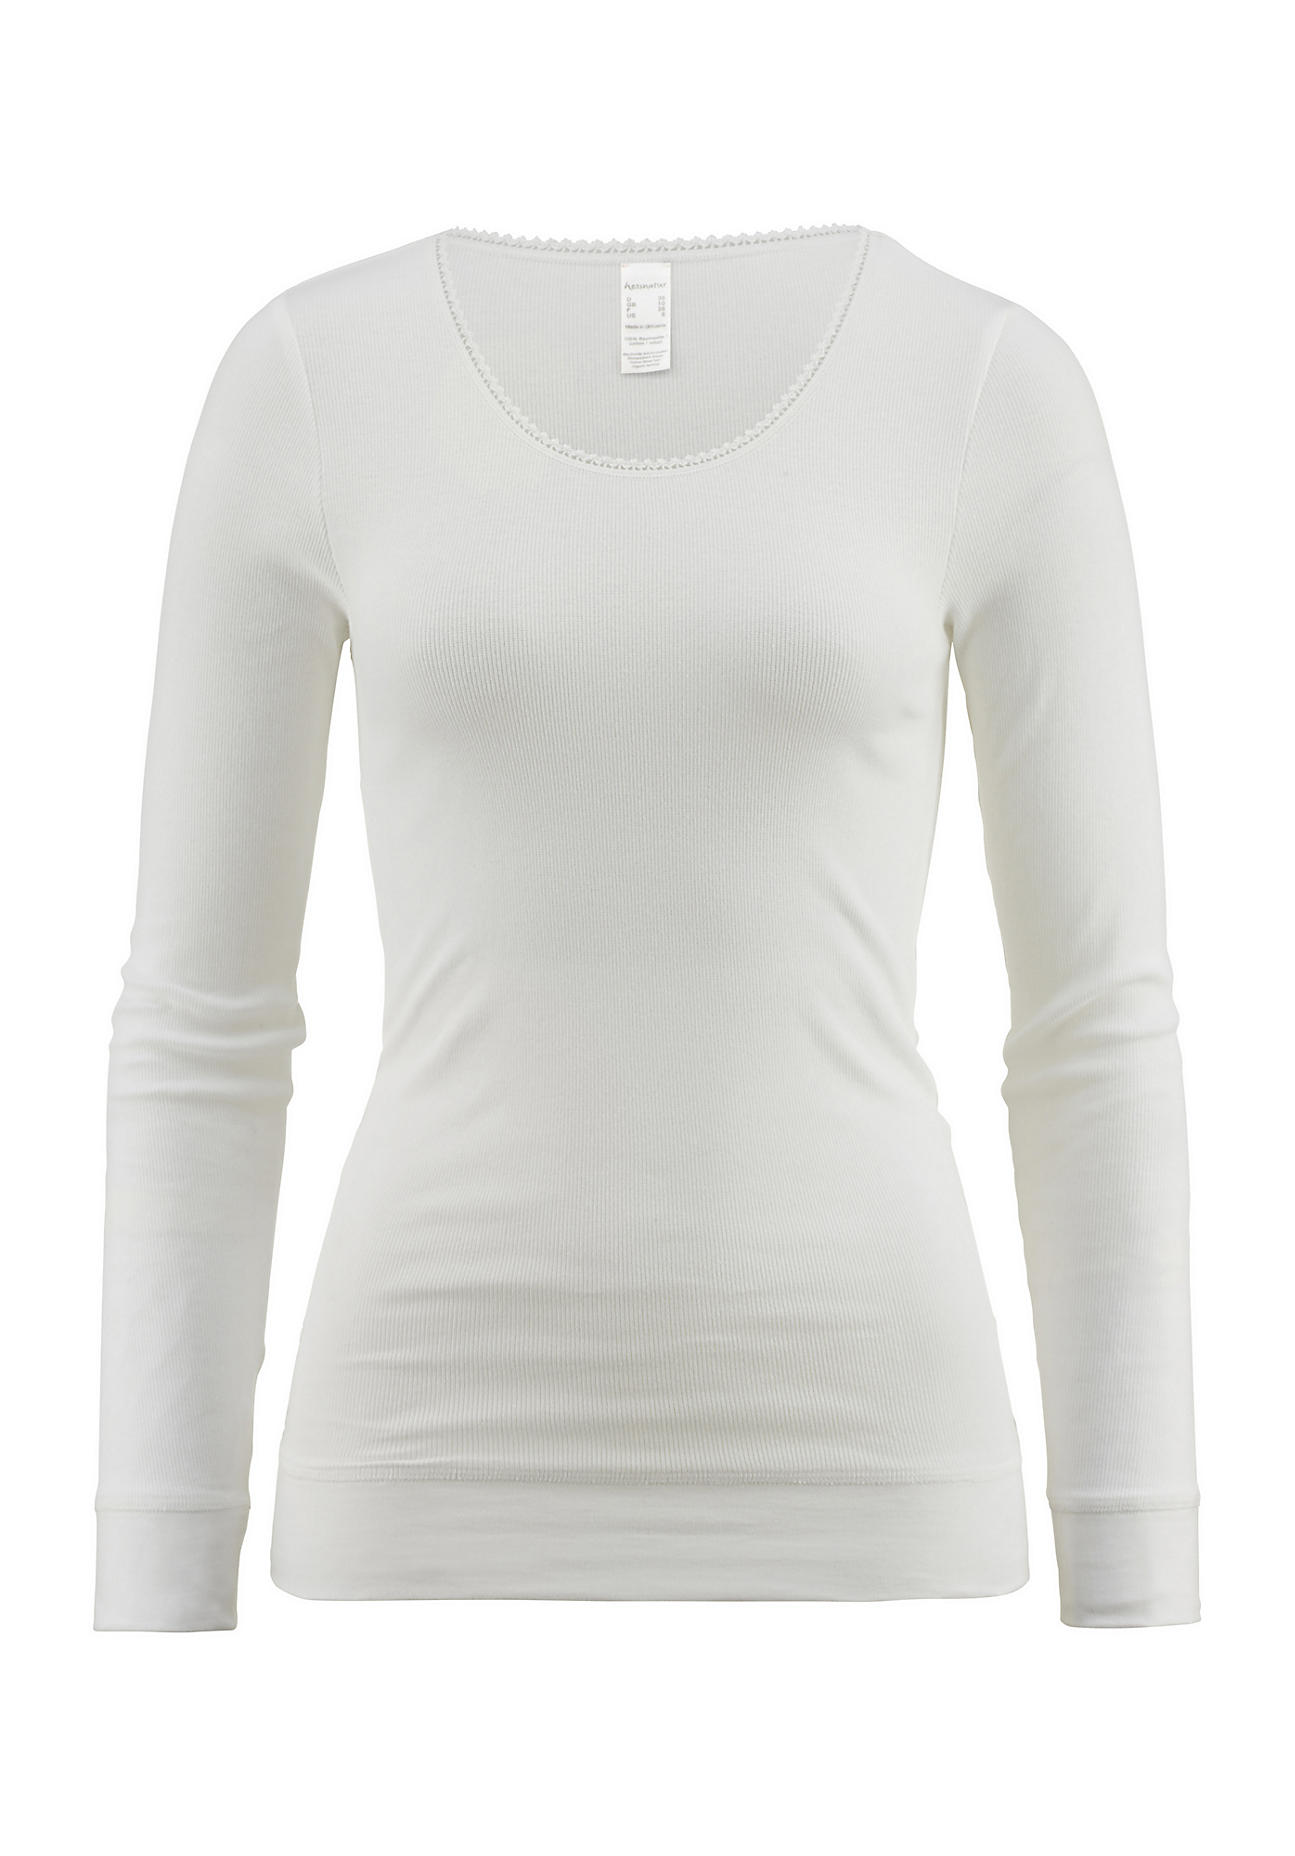 hessnatur Damen Langarm-Shirt aus Bio-Baumwolle – weiß – Größe 46   Bekleidung > Shirts > Langarmshirts   hessnatur